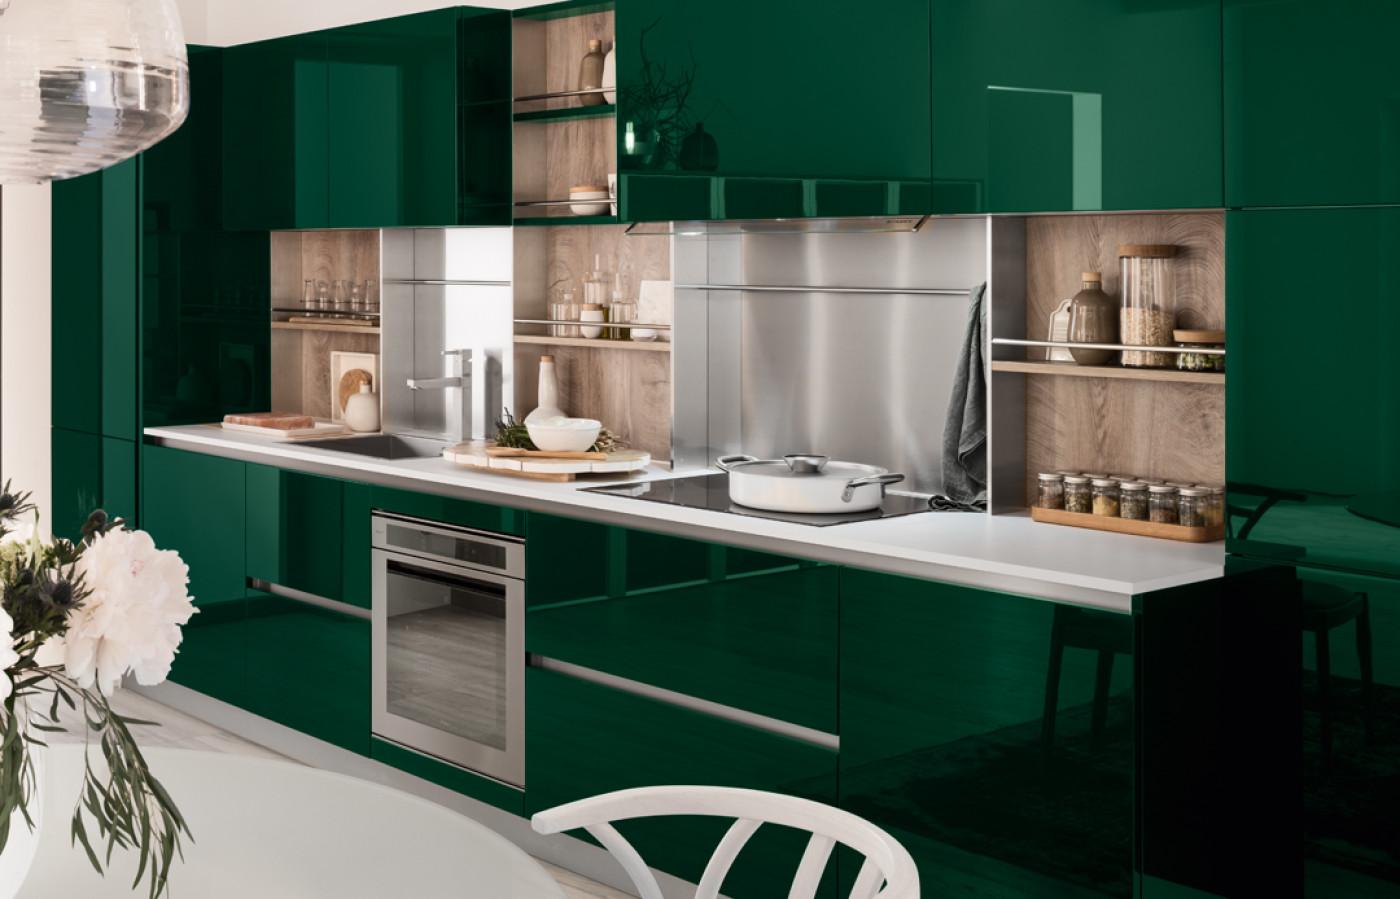 Veneta Cucine Modello Reflex.Cucine Bergamin Arredamenti